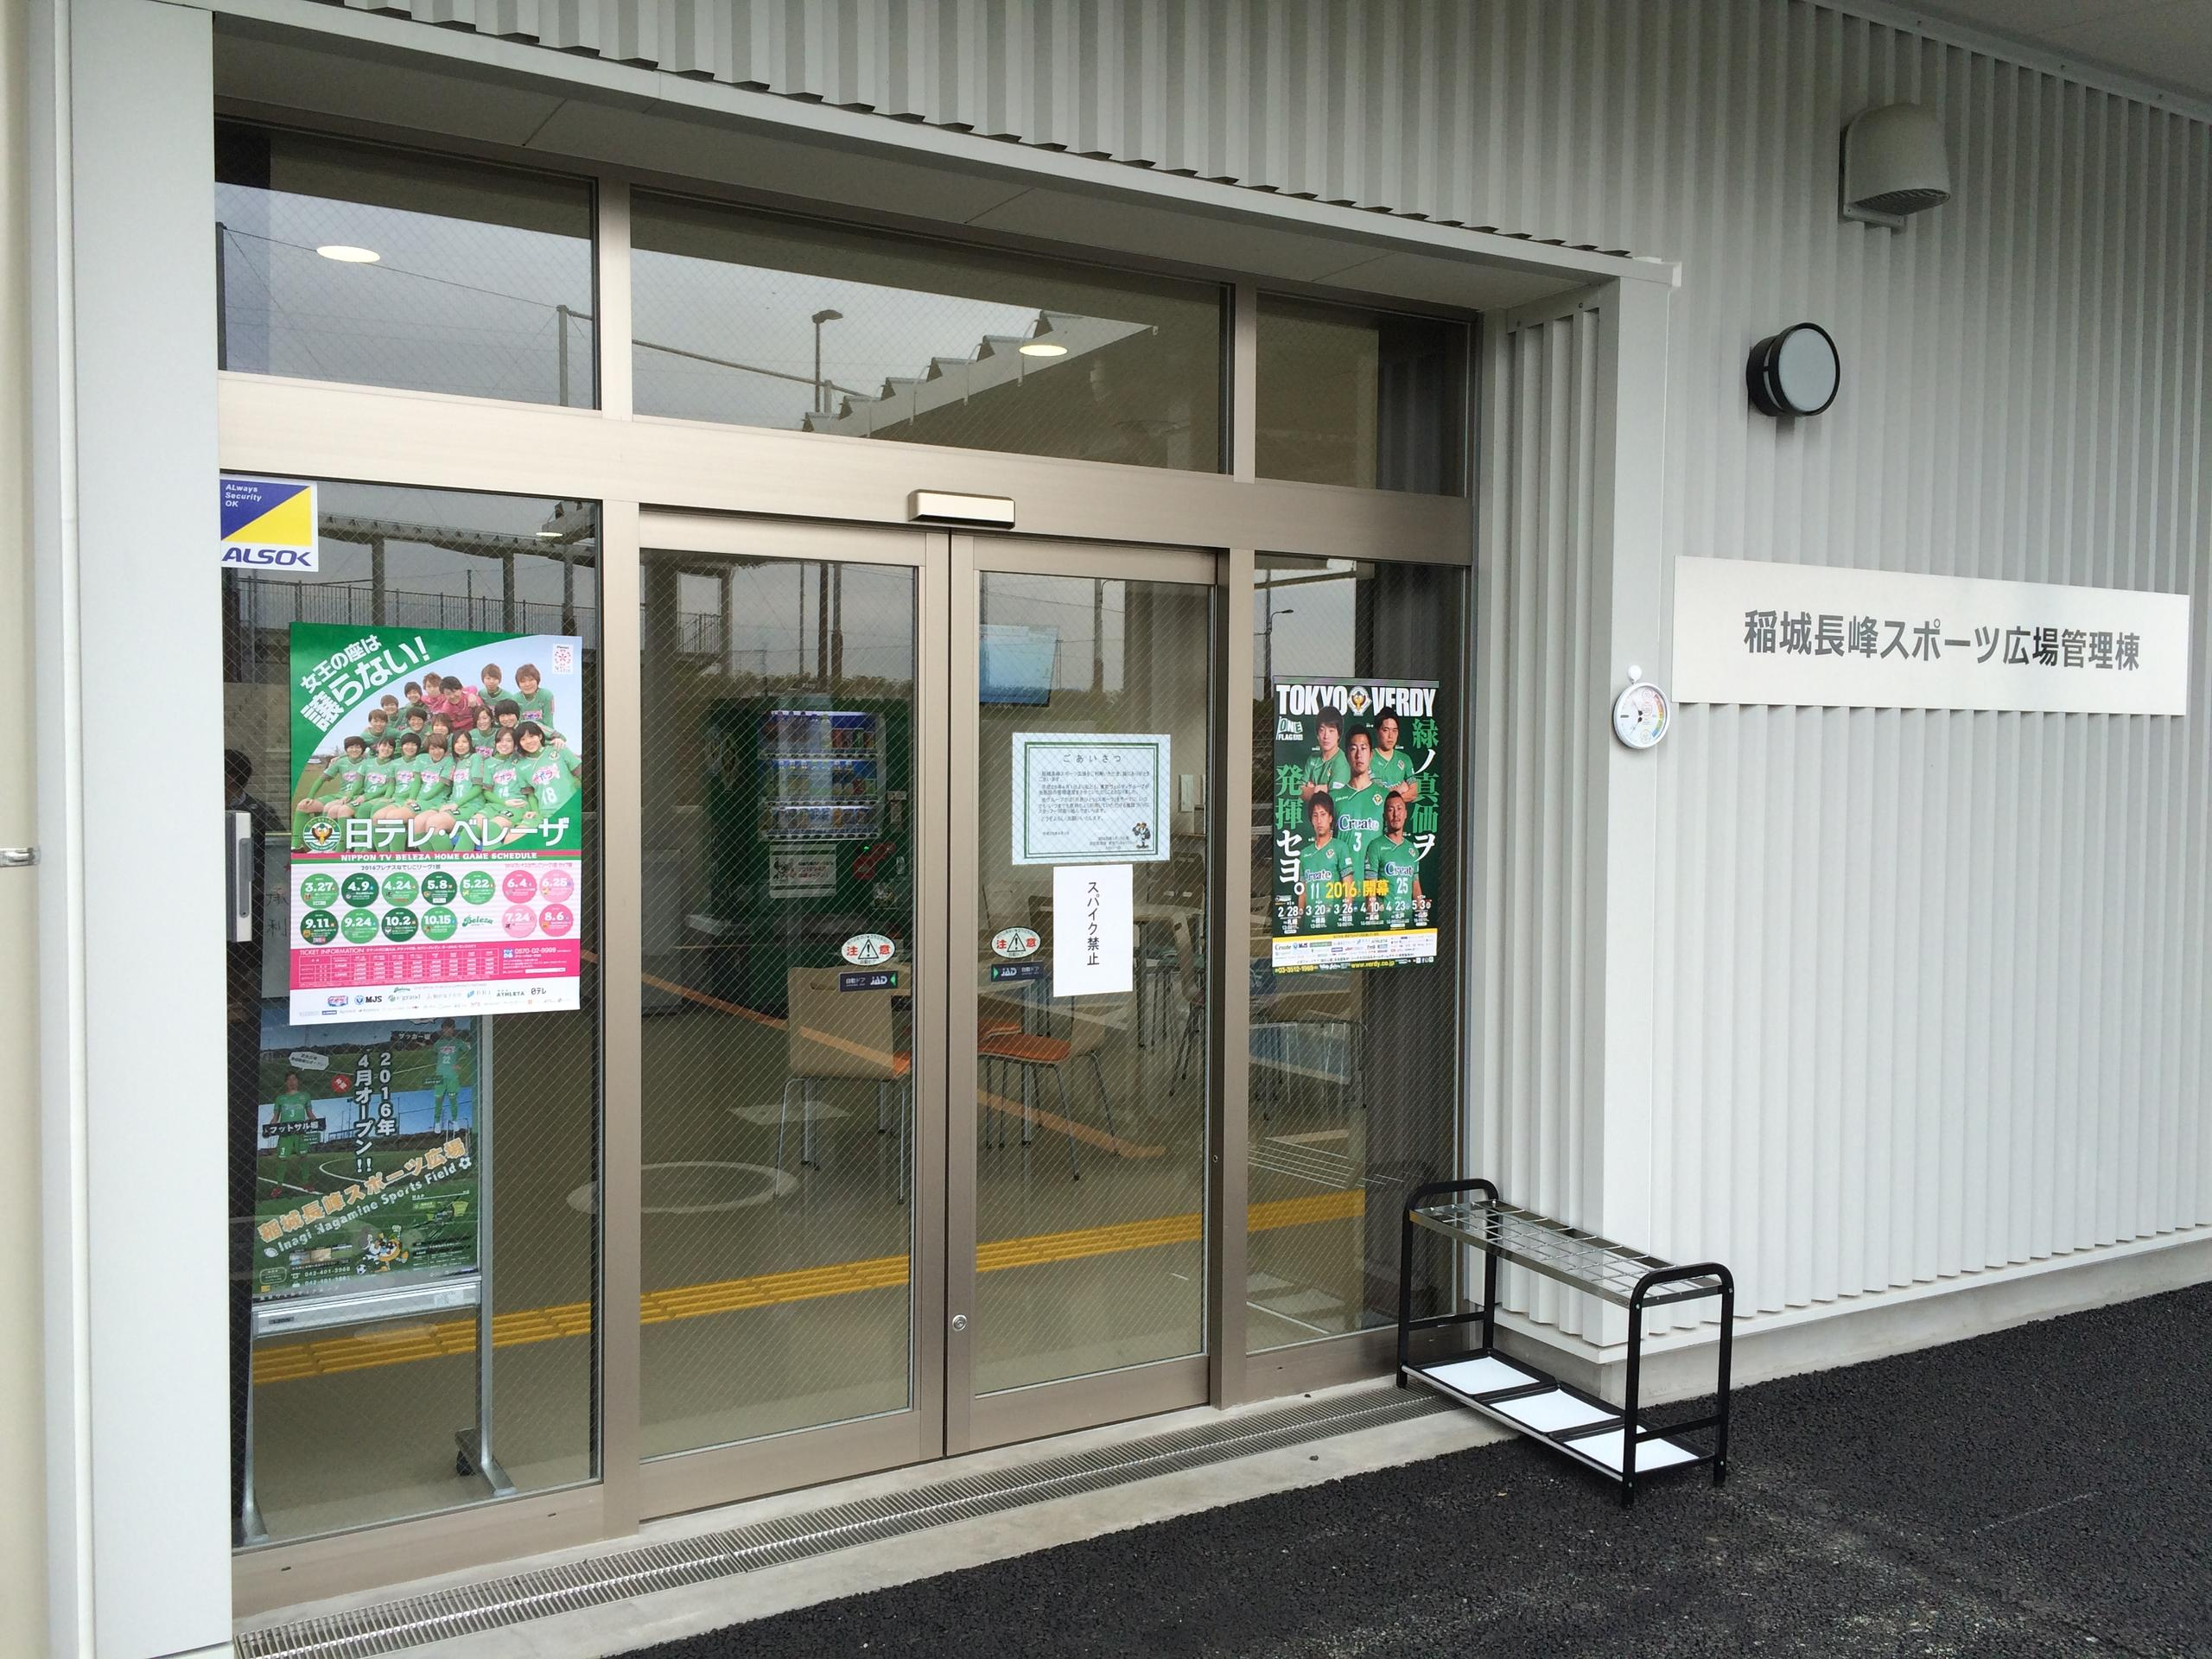 20160401inagi (2).JPG